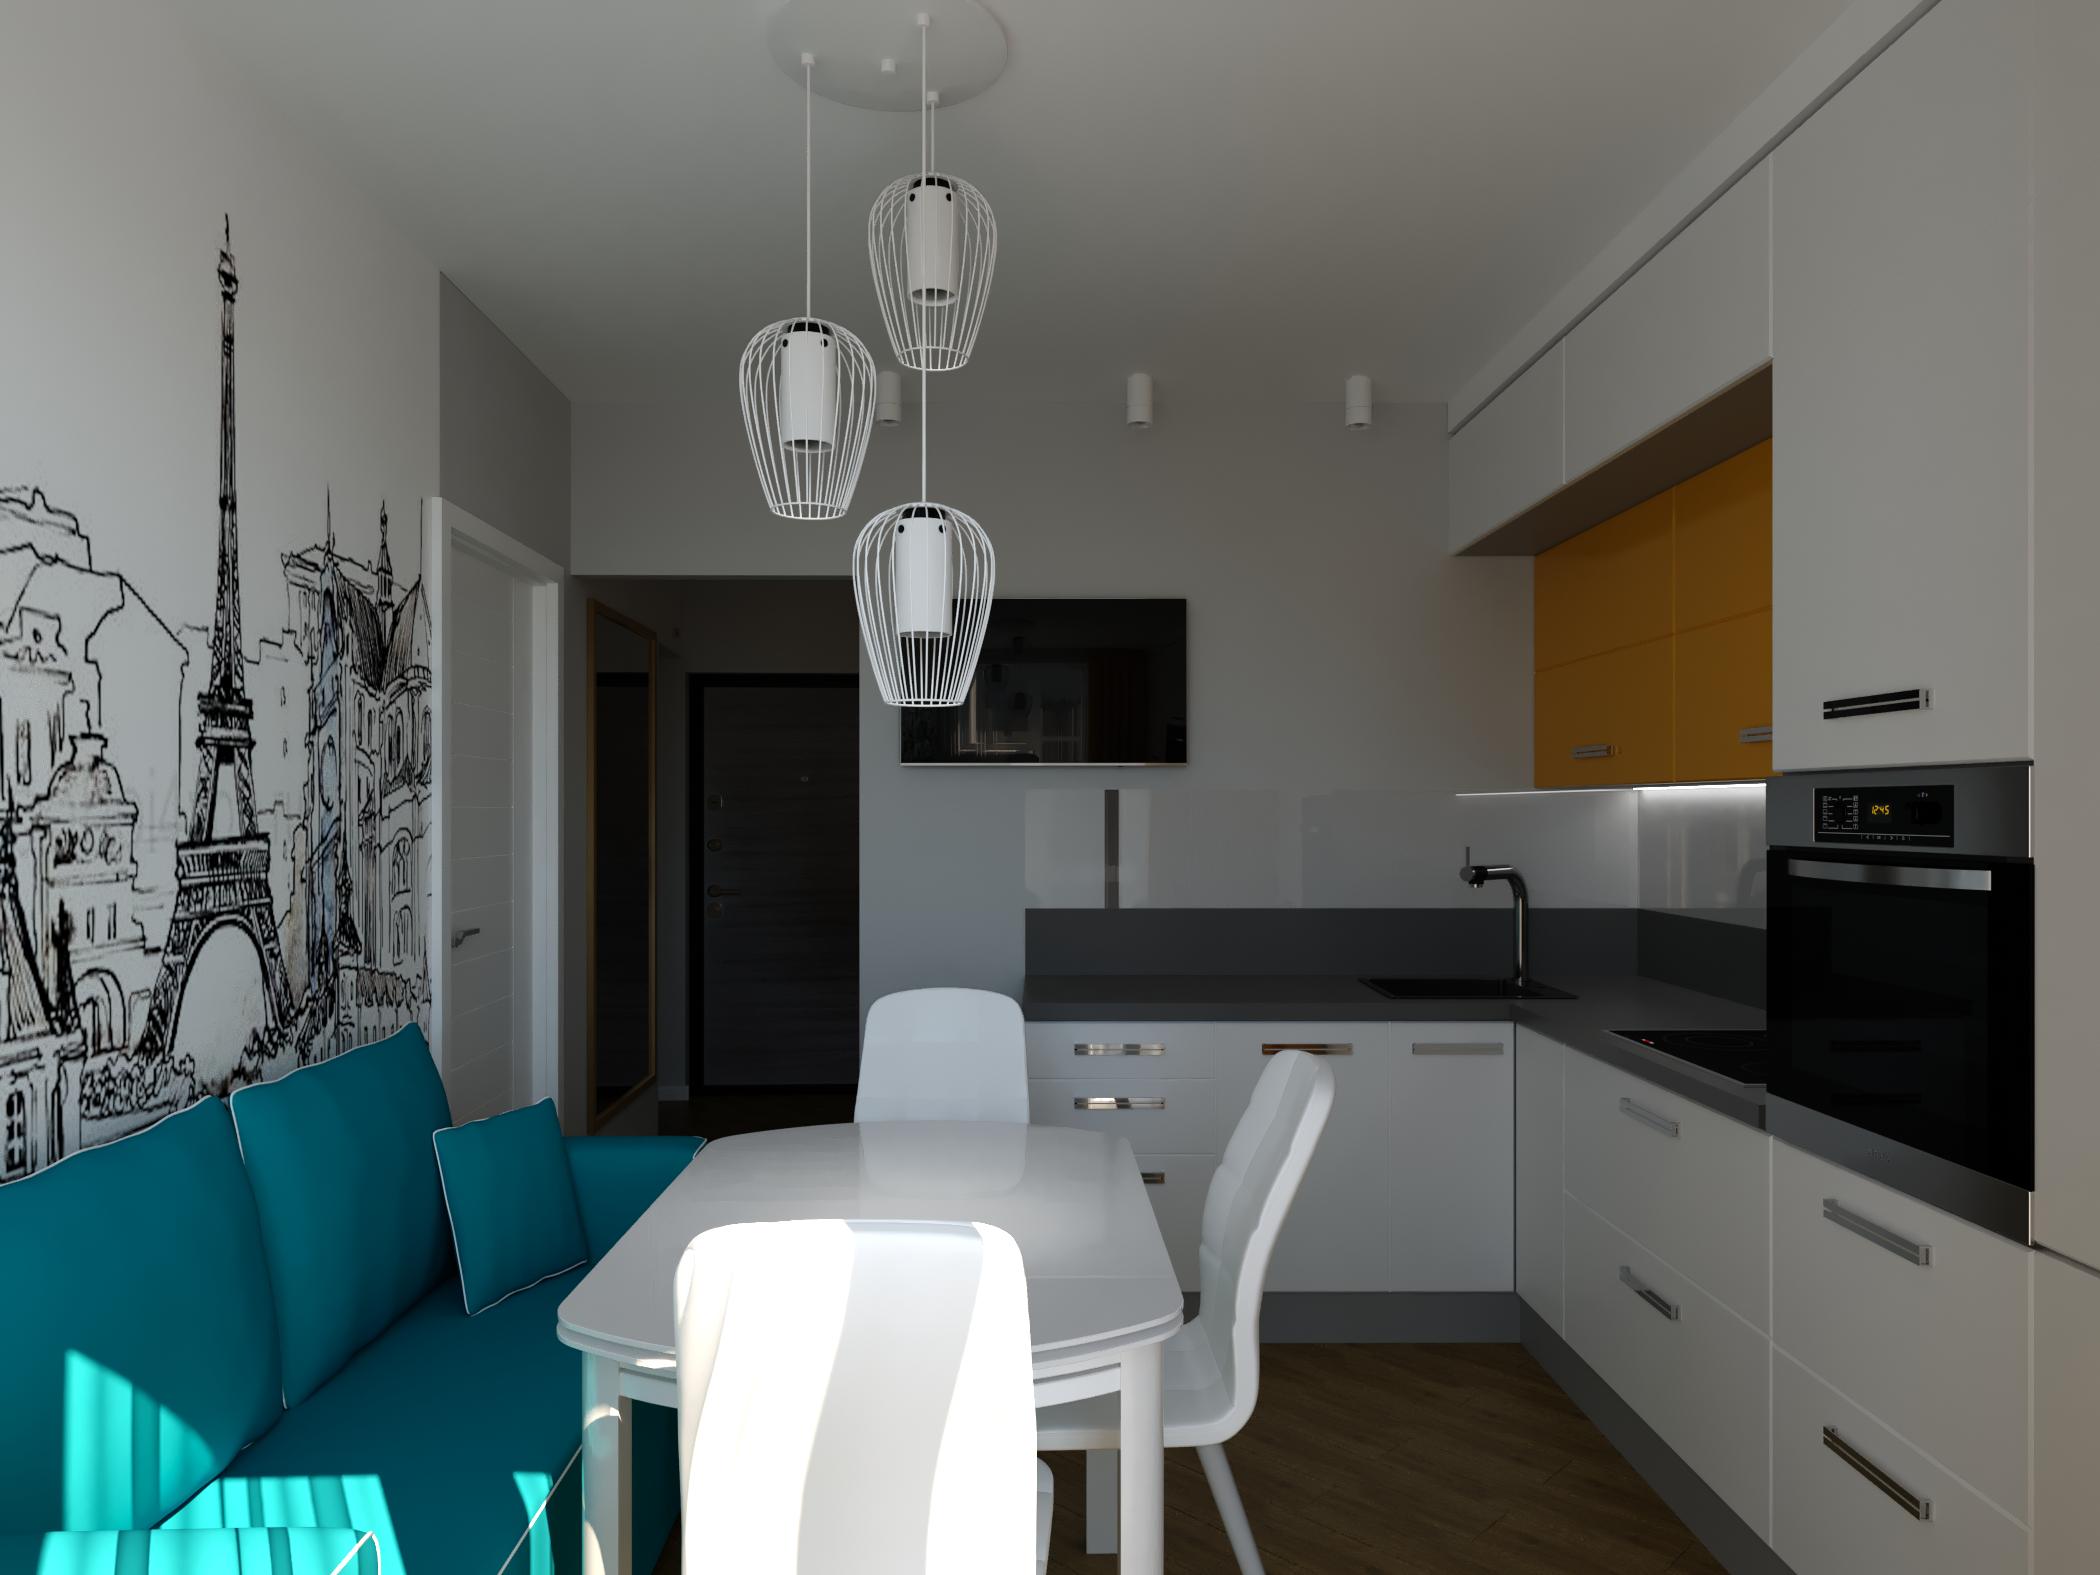 Kitchen in 3d max corona render image